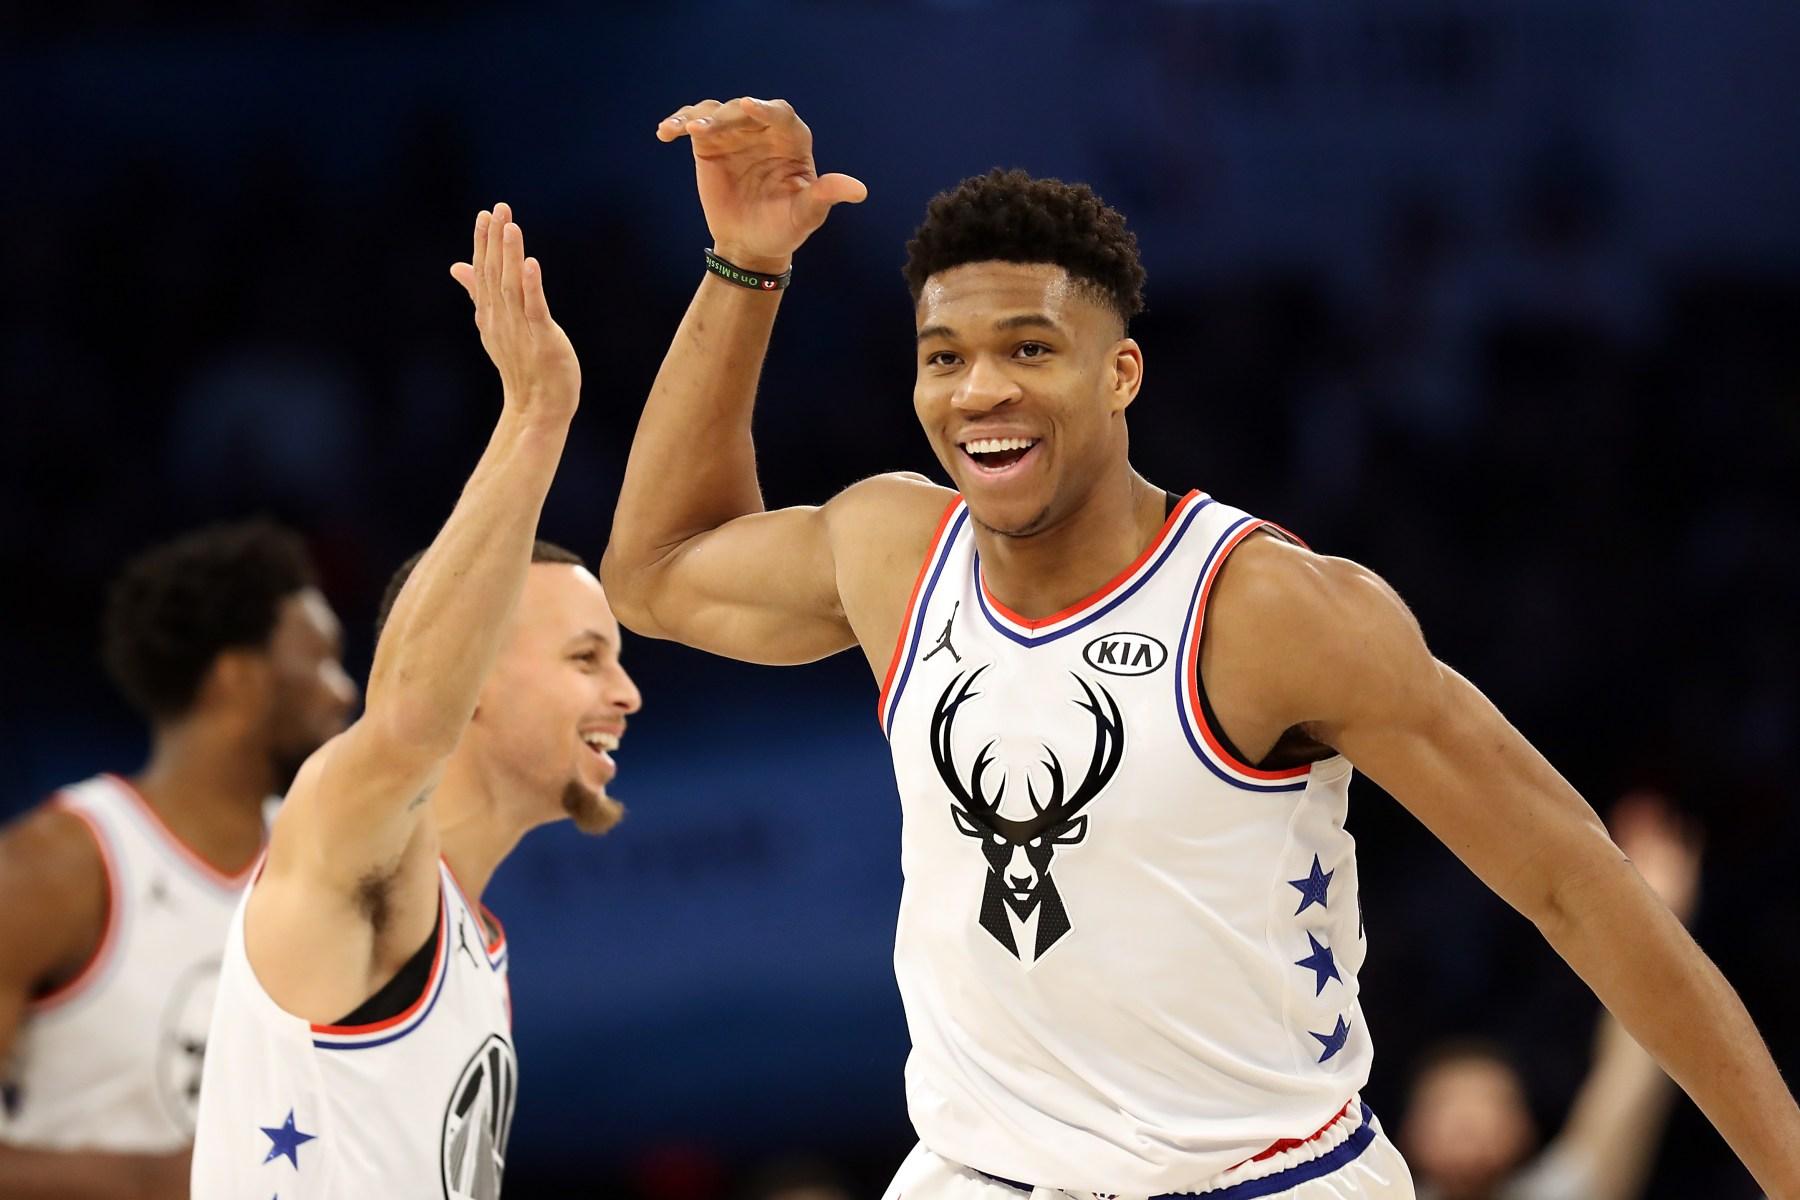 Wisconsin MVPs